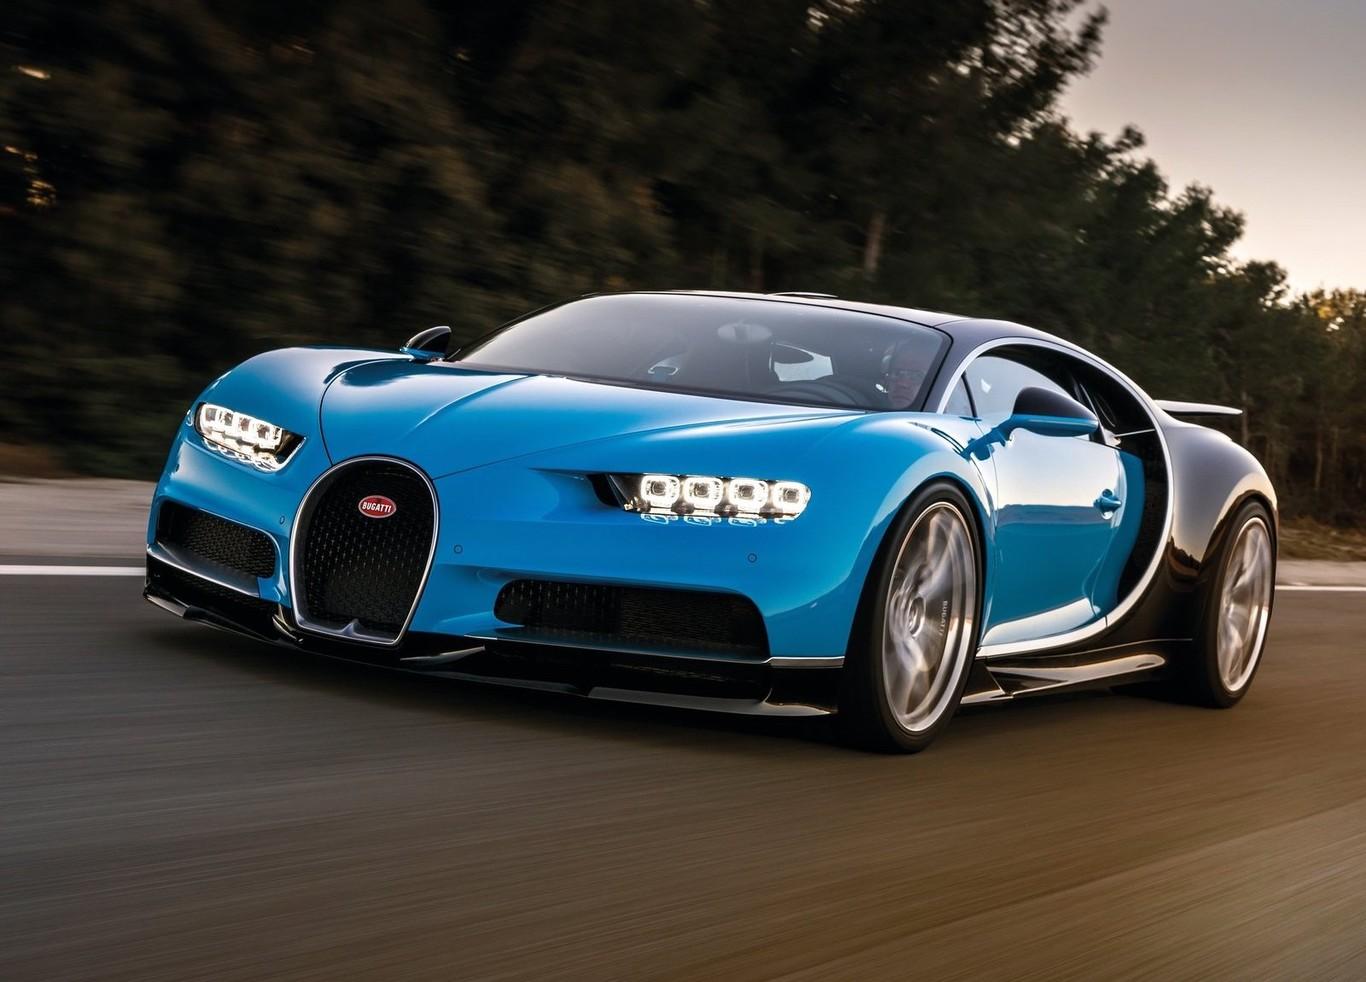 2021 Bugatti Veyron Release Date and Concept